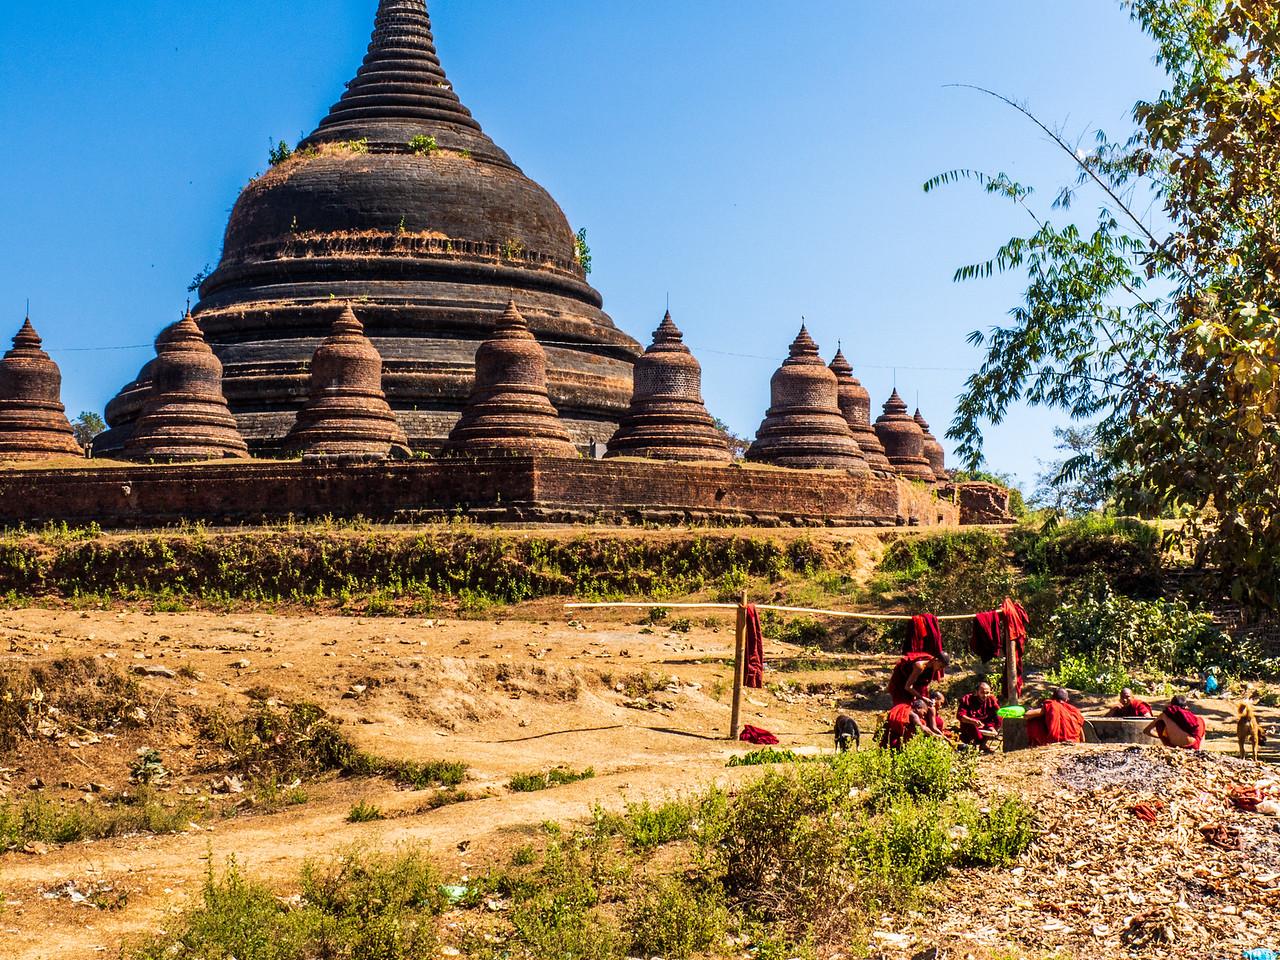 Andaw Temple in Mrauk U, Myanmar